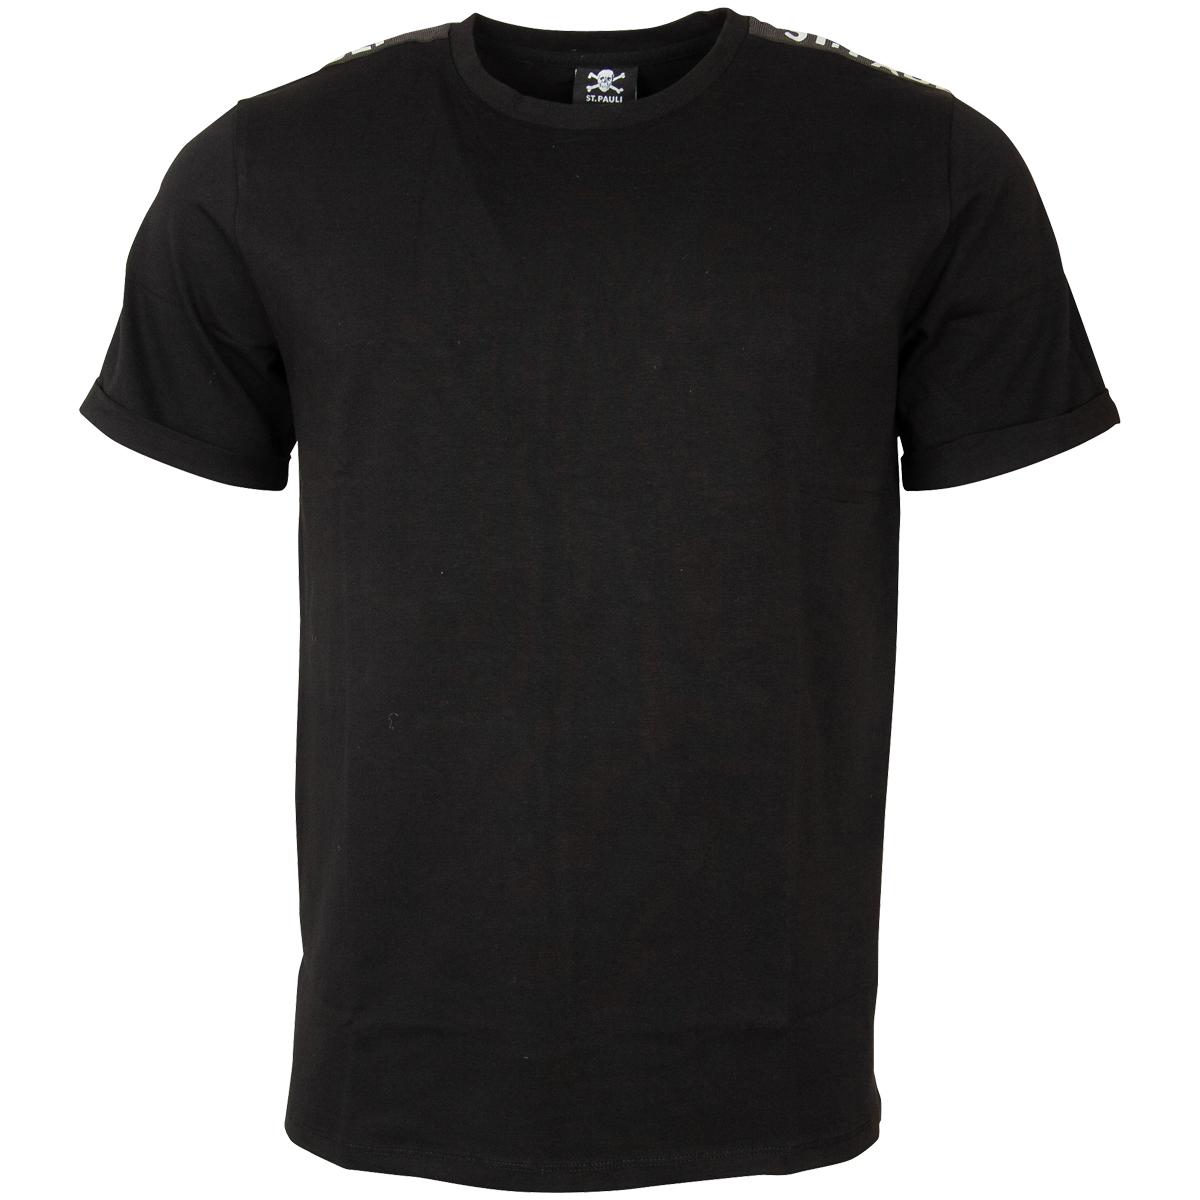 FC St. Pauli - T-Shirt Streetlethics - schwarz